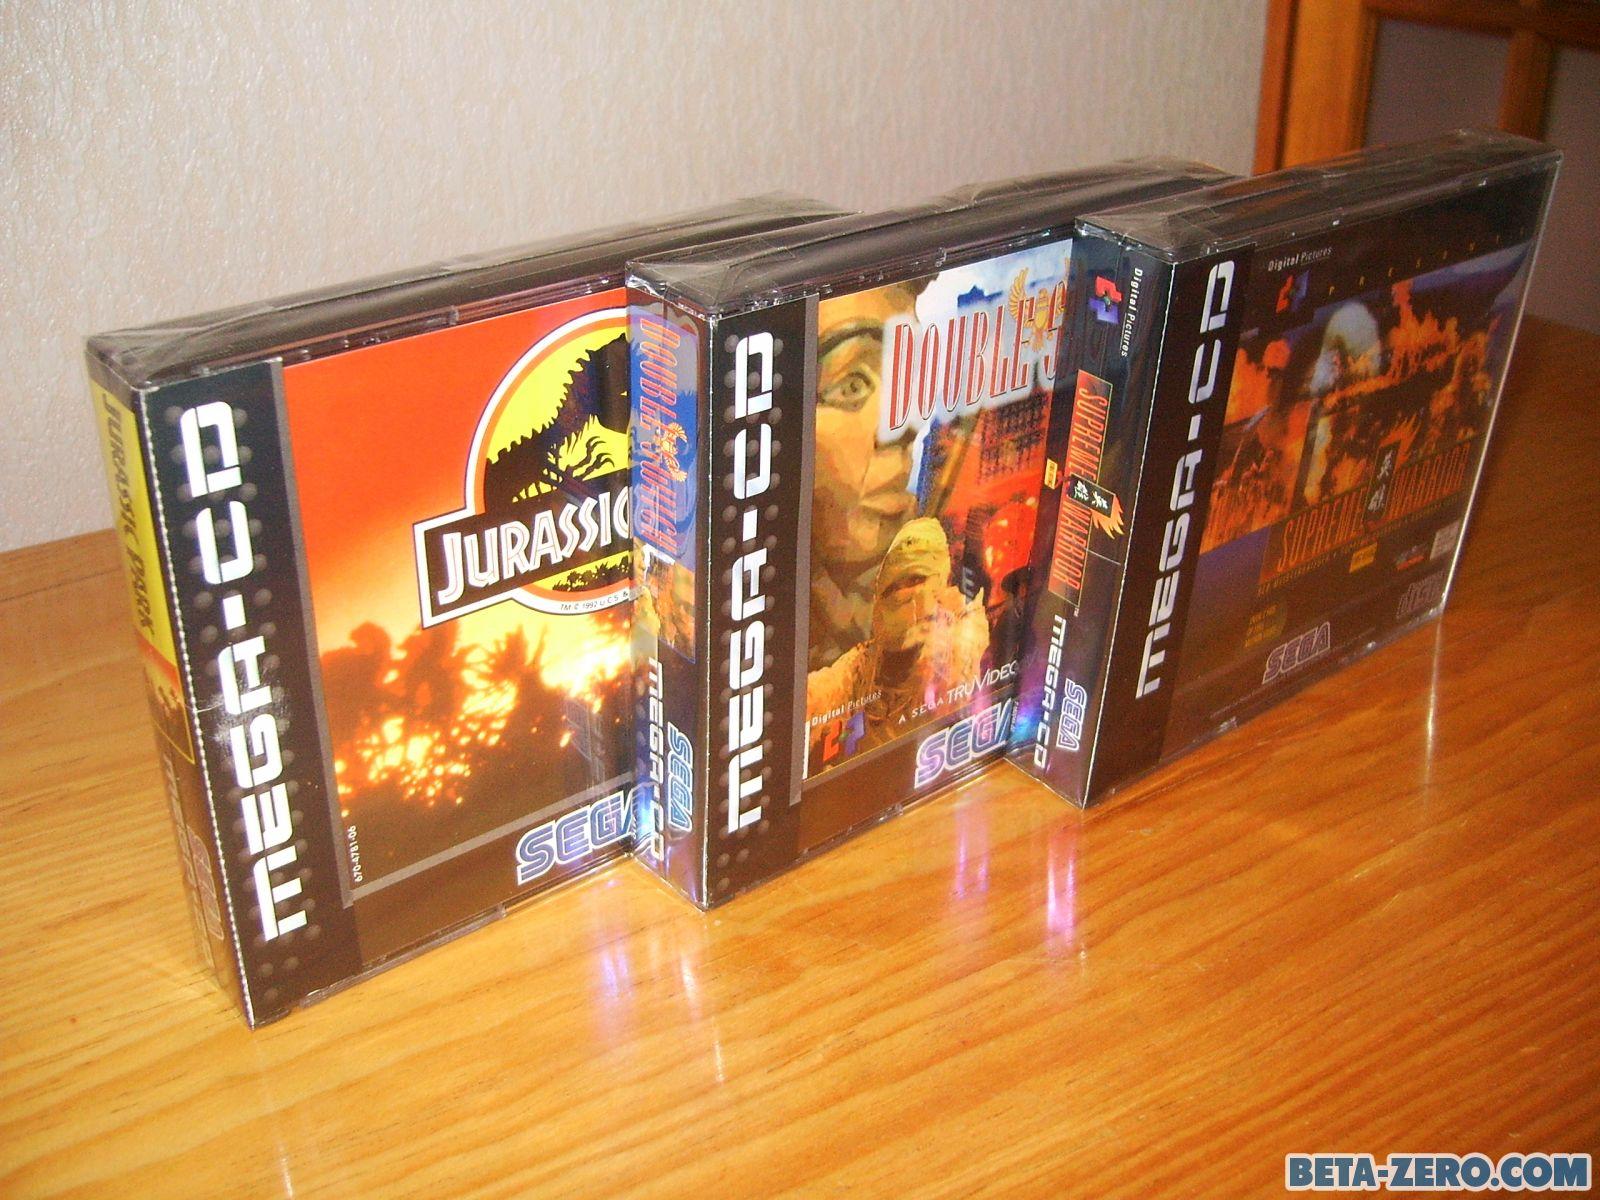 Jurassic Park (version spain), Double Switch y Supreme Warrior